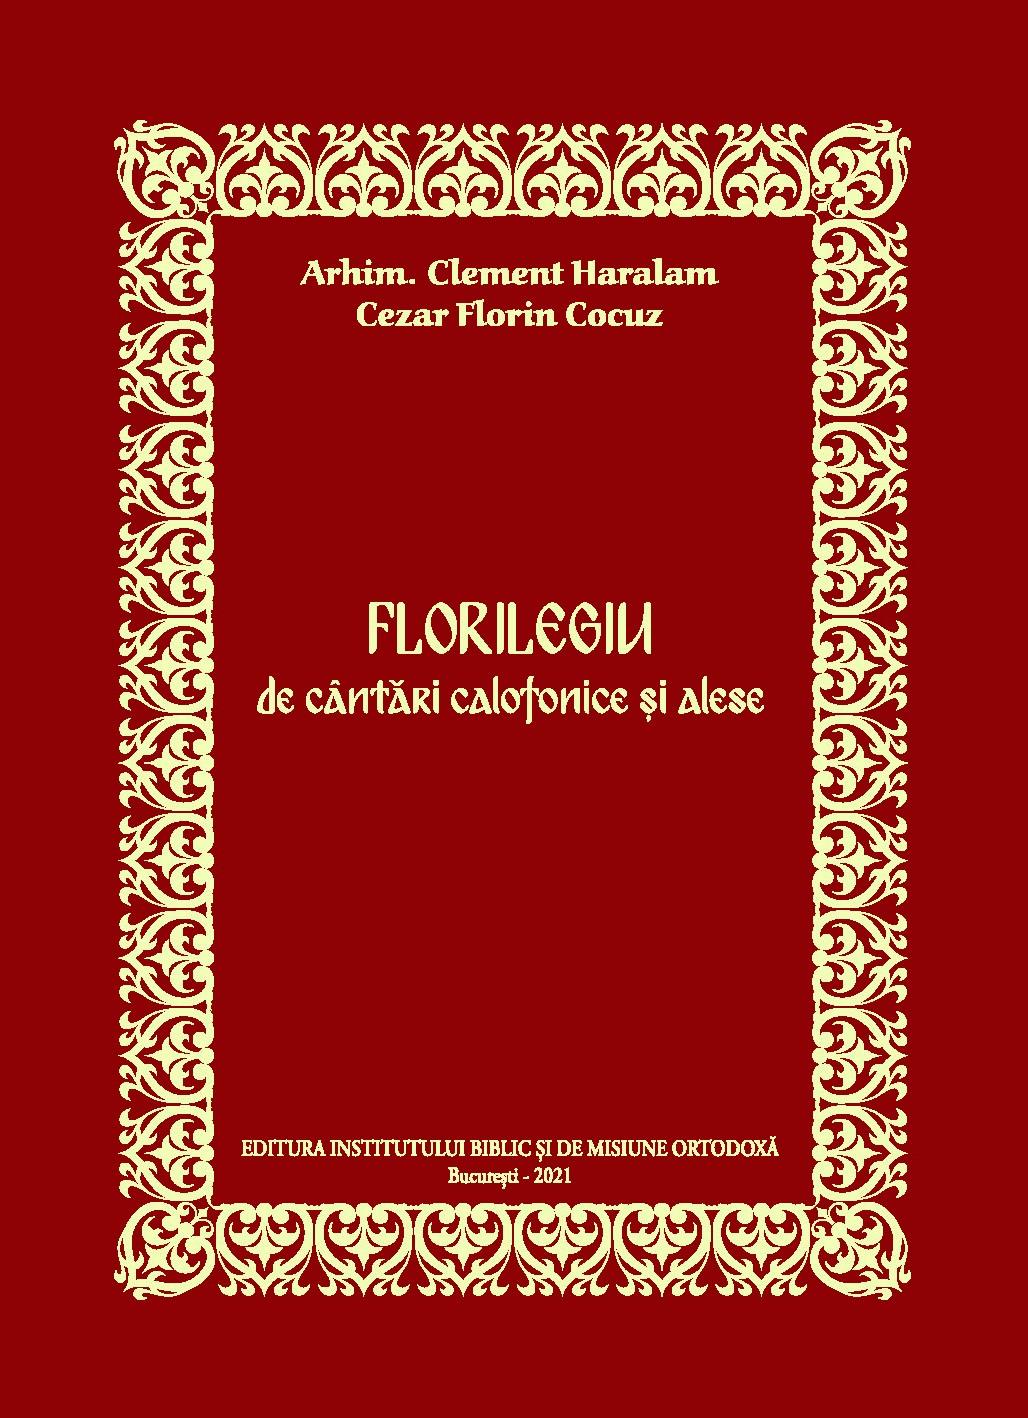 Florilegiu de cantari calofonice si alese de Arhim. Clement HARALAM, Cezar Florin COCUZ